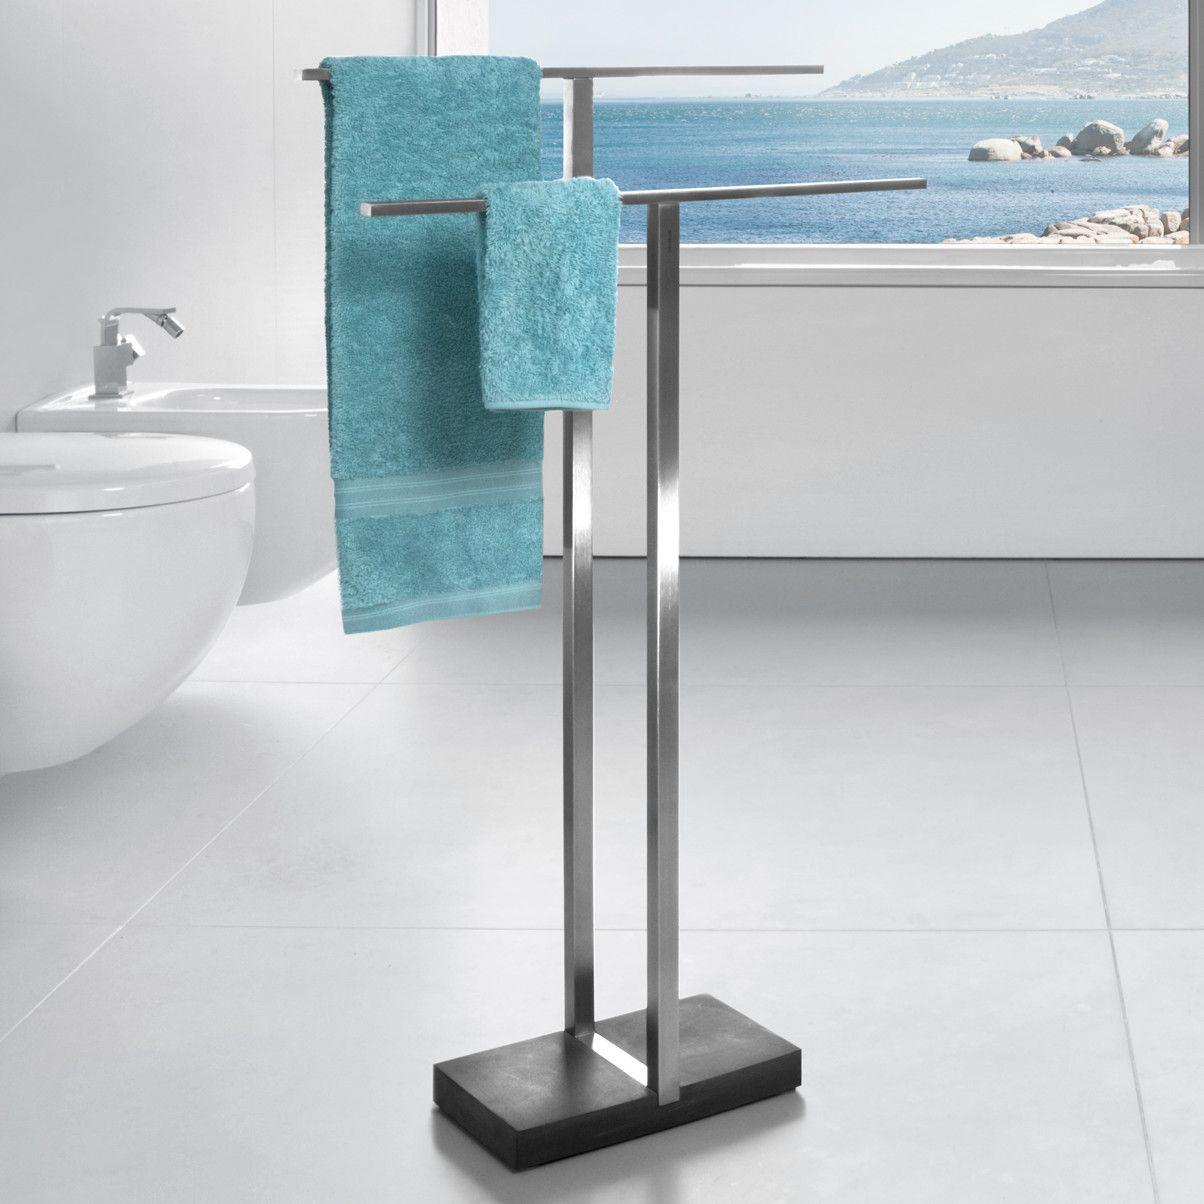 Menoto Free Standing Towel Stand | Towels, Free standing towel rack ...